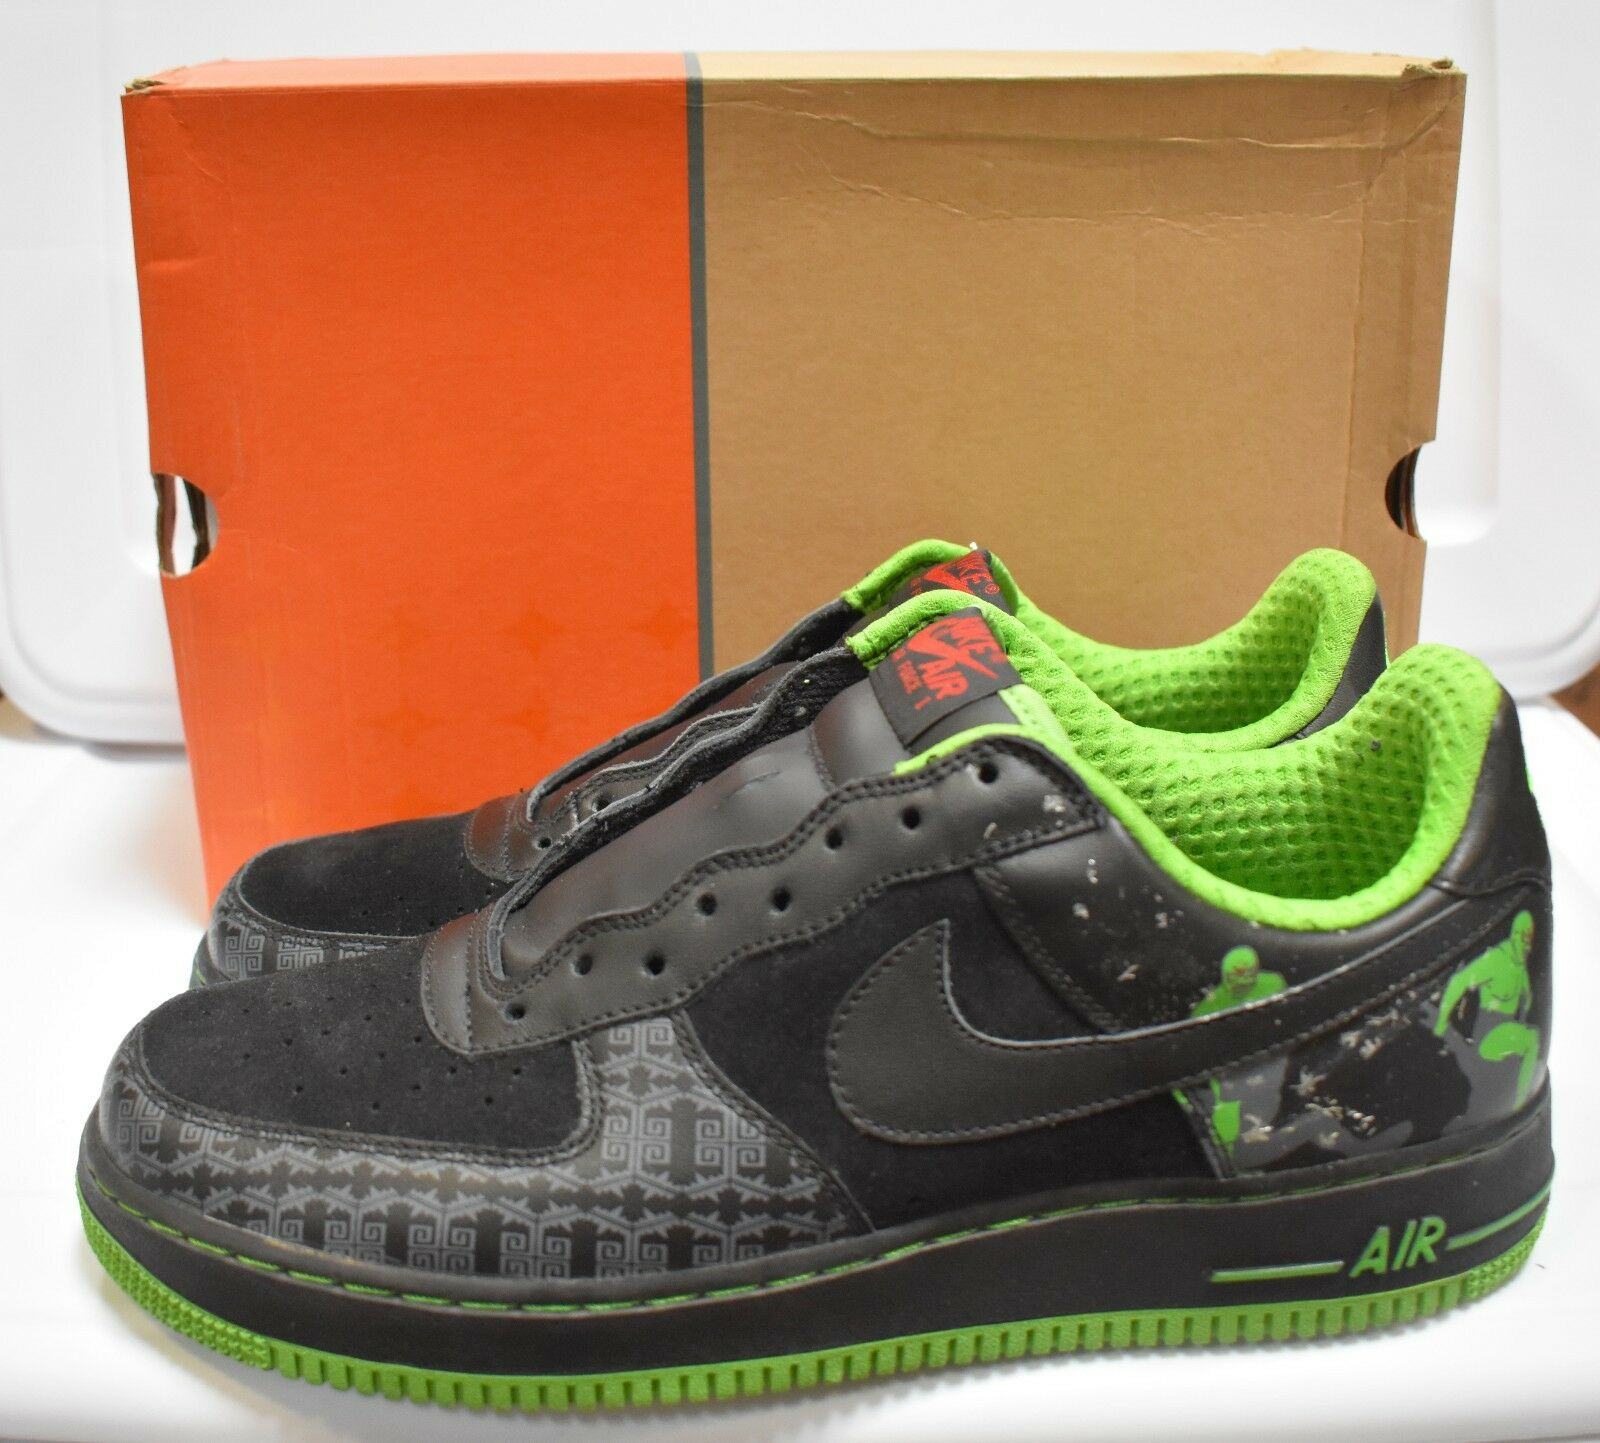 Nike Air Force 1 Premium Black    Black Green  Lucha Libre  313641 002 Size 11 8f8409